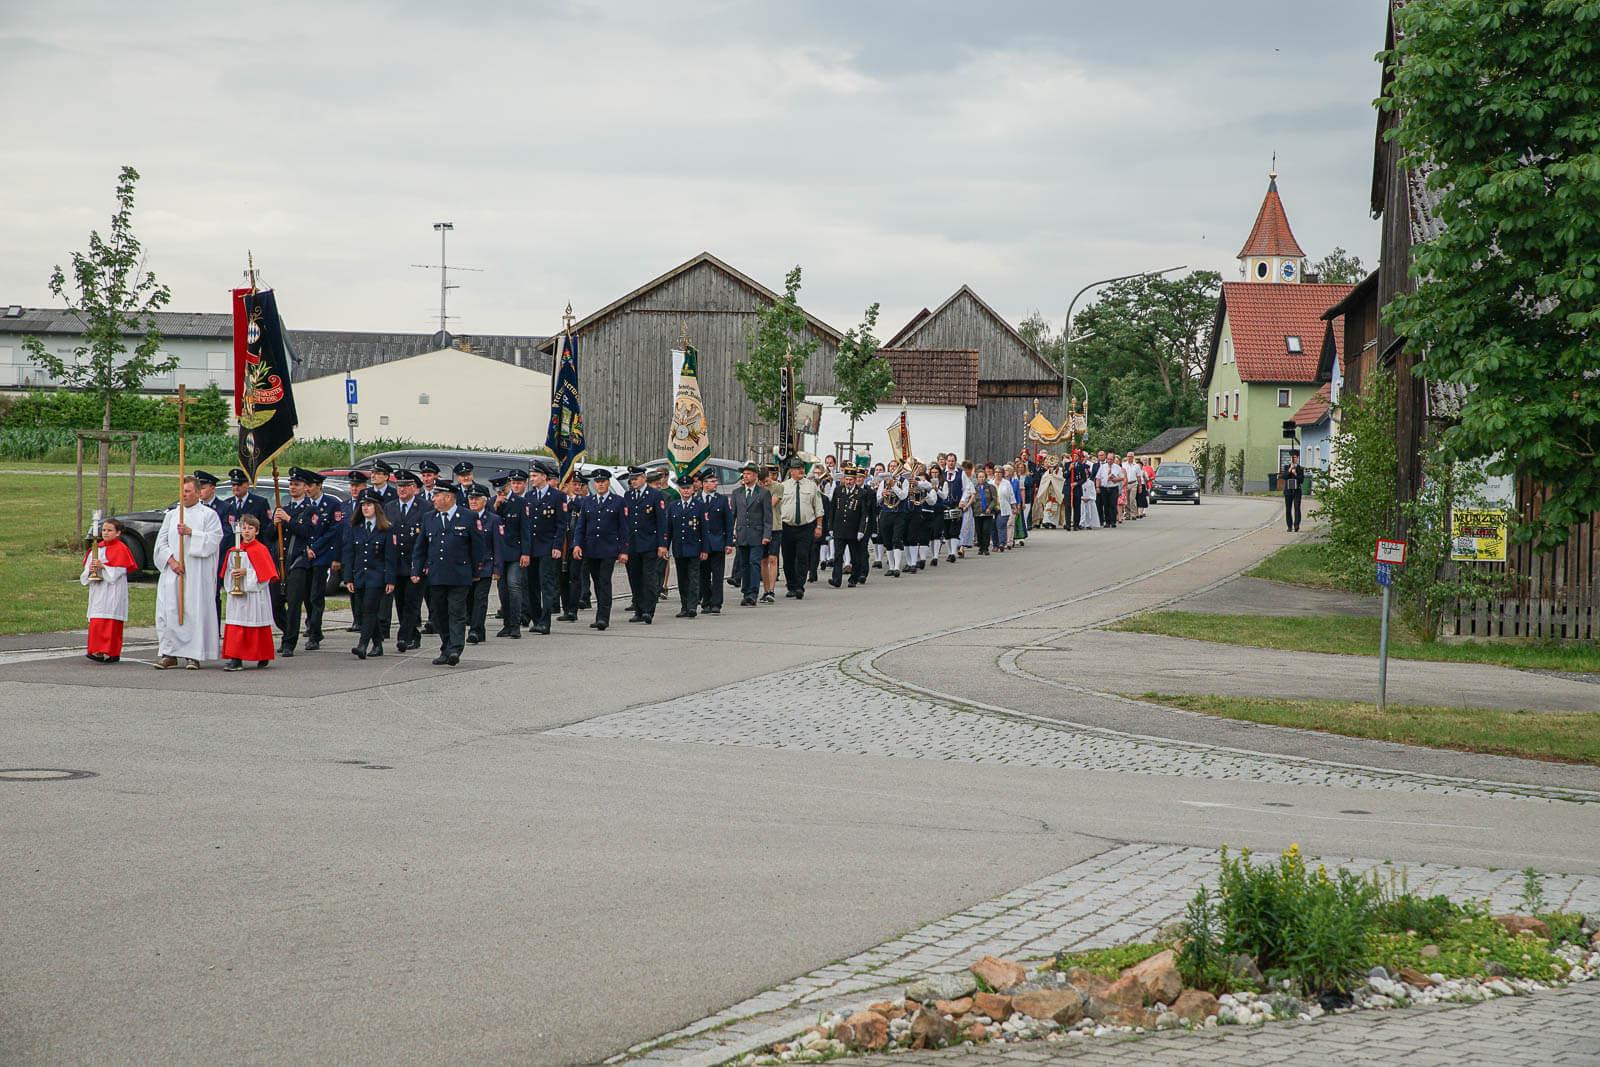 Wölsendorf